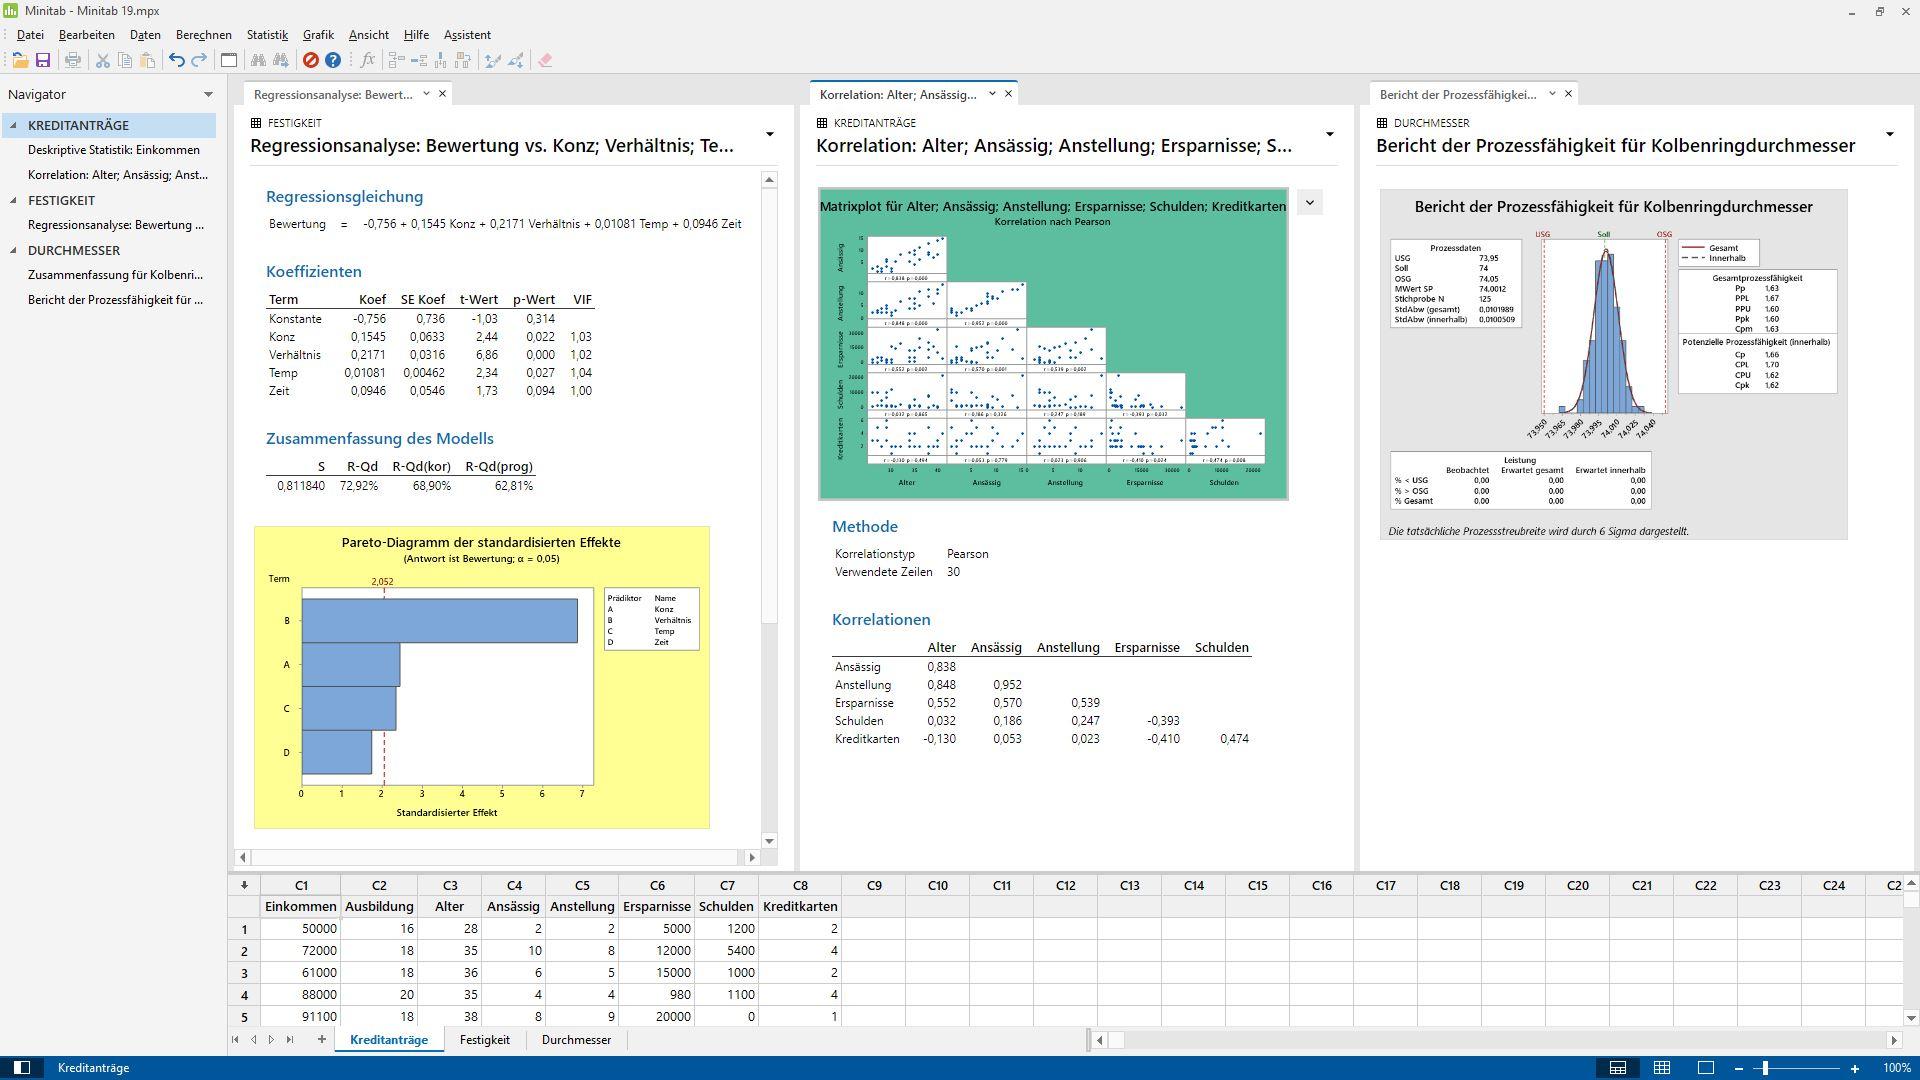 Minitab 2020 – quality management software – and Minitab Workspace